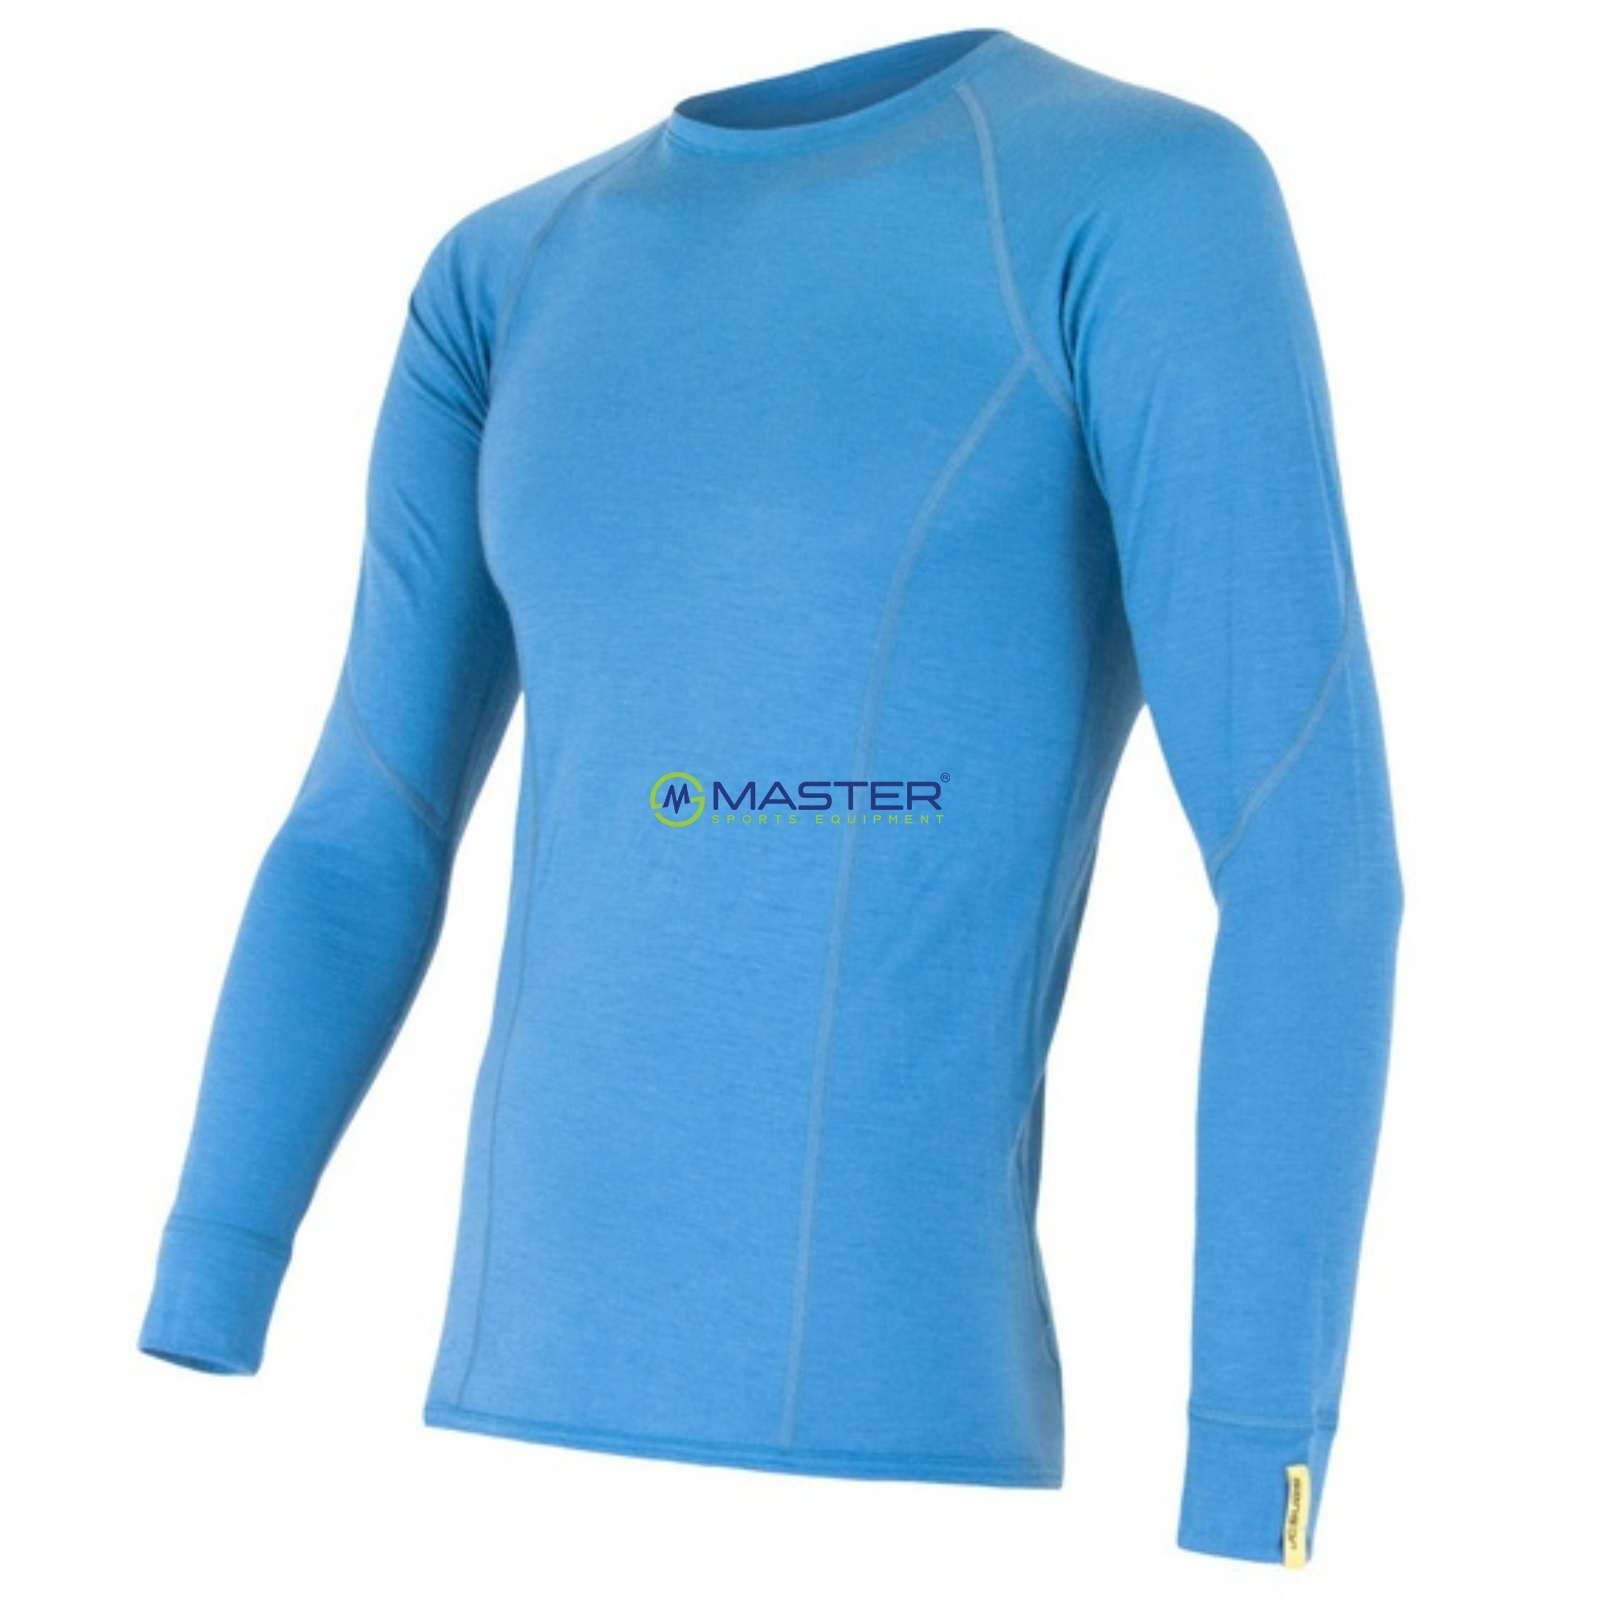 Triko dlouhý rukáv SENSOR Merino Wool Active pánské modré ... fff7395407